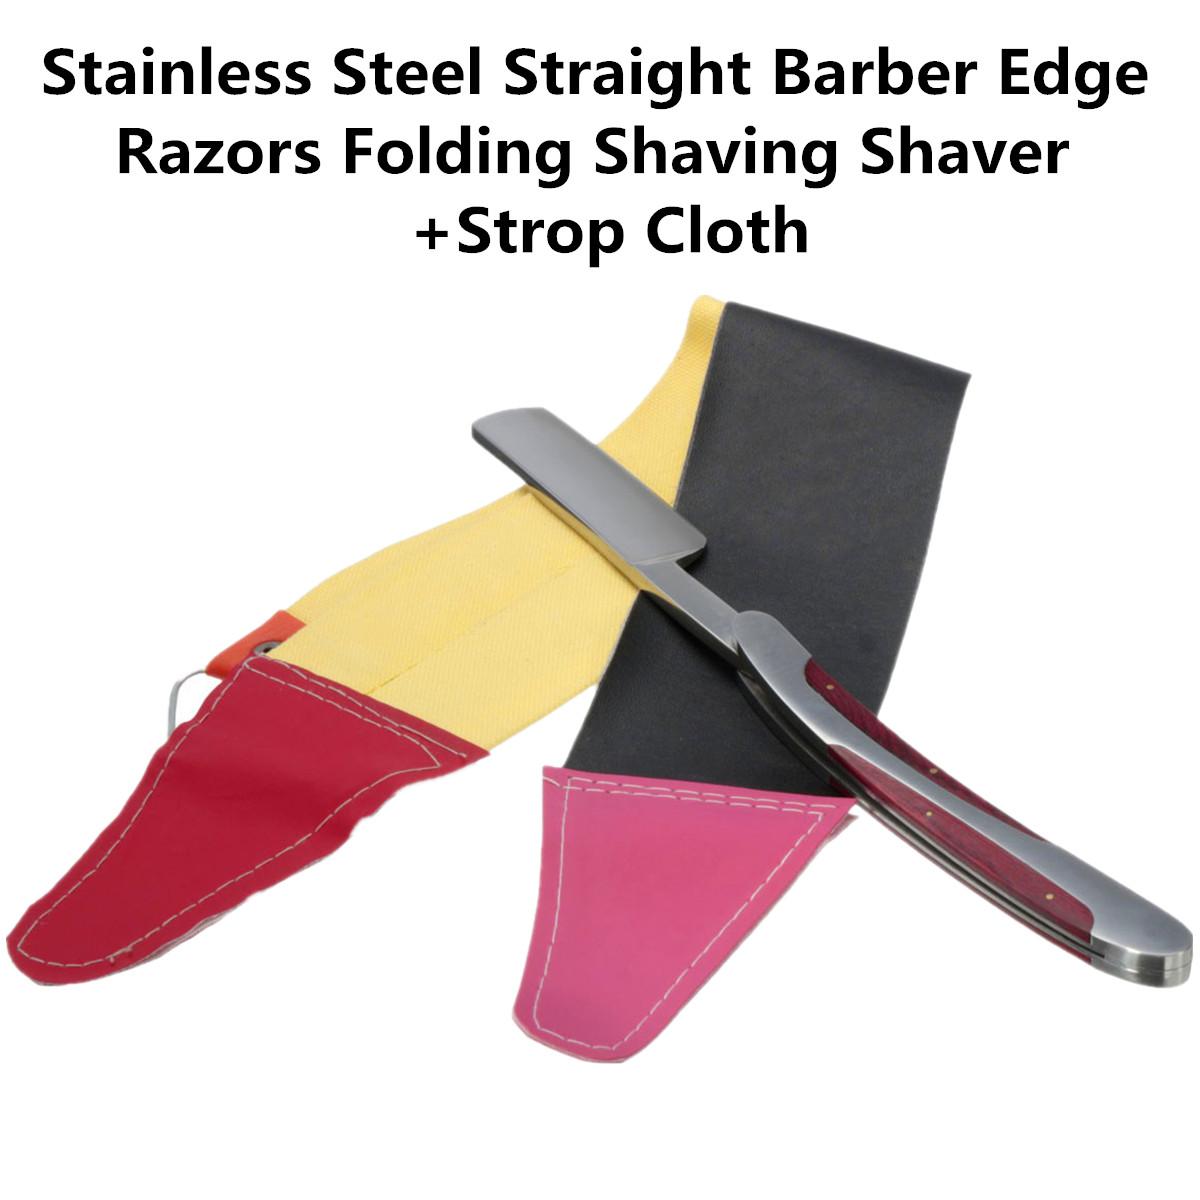 Barber Edge : ... Steel Straight Barber Edge Razors Folding Shaving Shaver+Strop Cloth